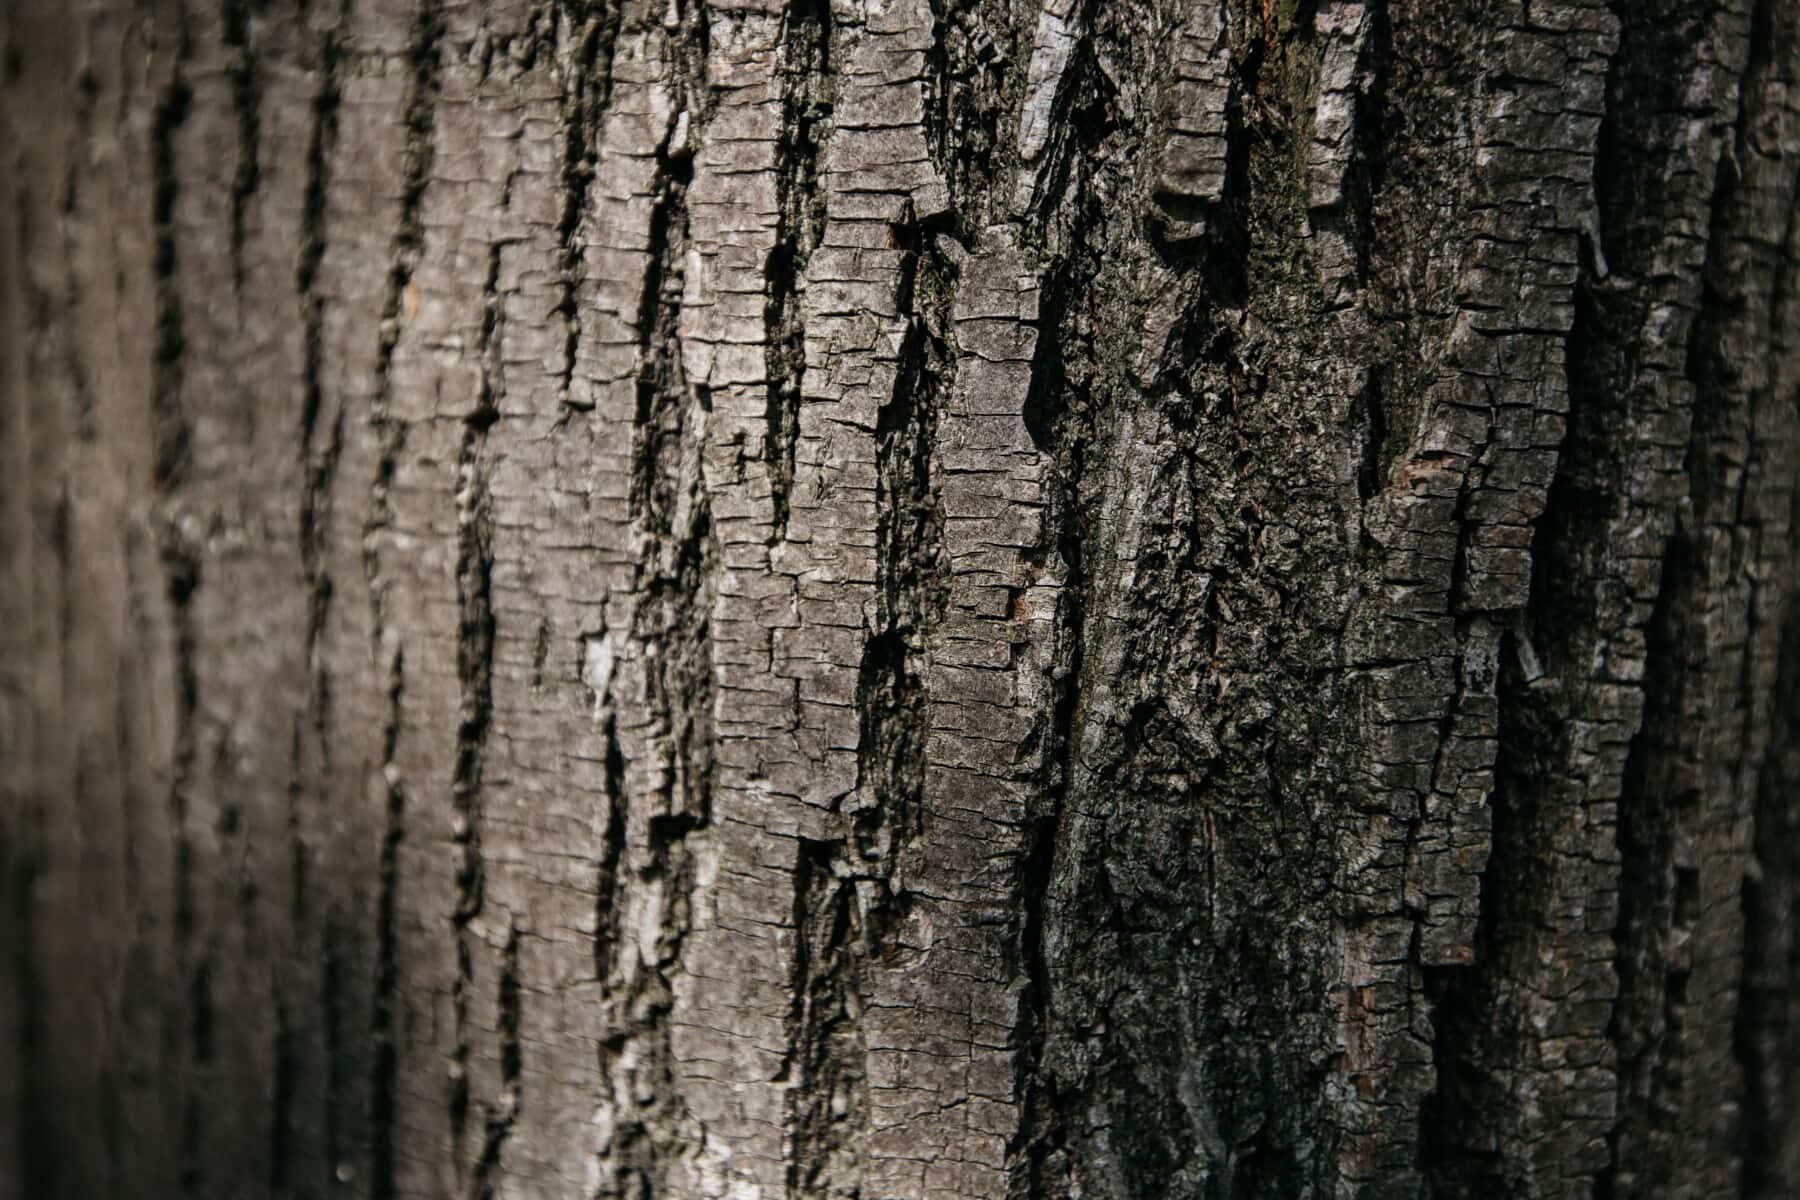 Holz, Struktur, Kortex, Borke, Schwarz, aus nächster Nähe, Textur, Holz, Stamm, rau